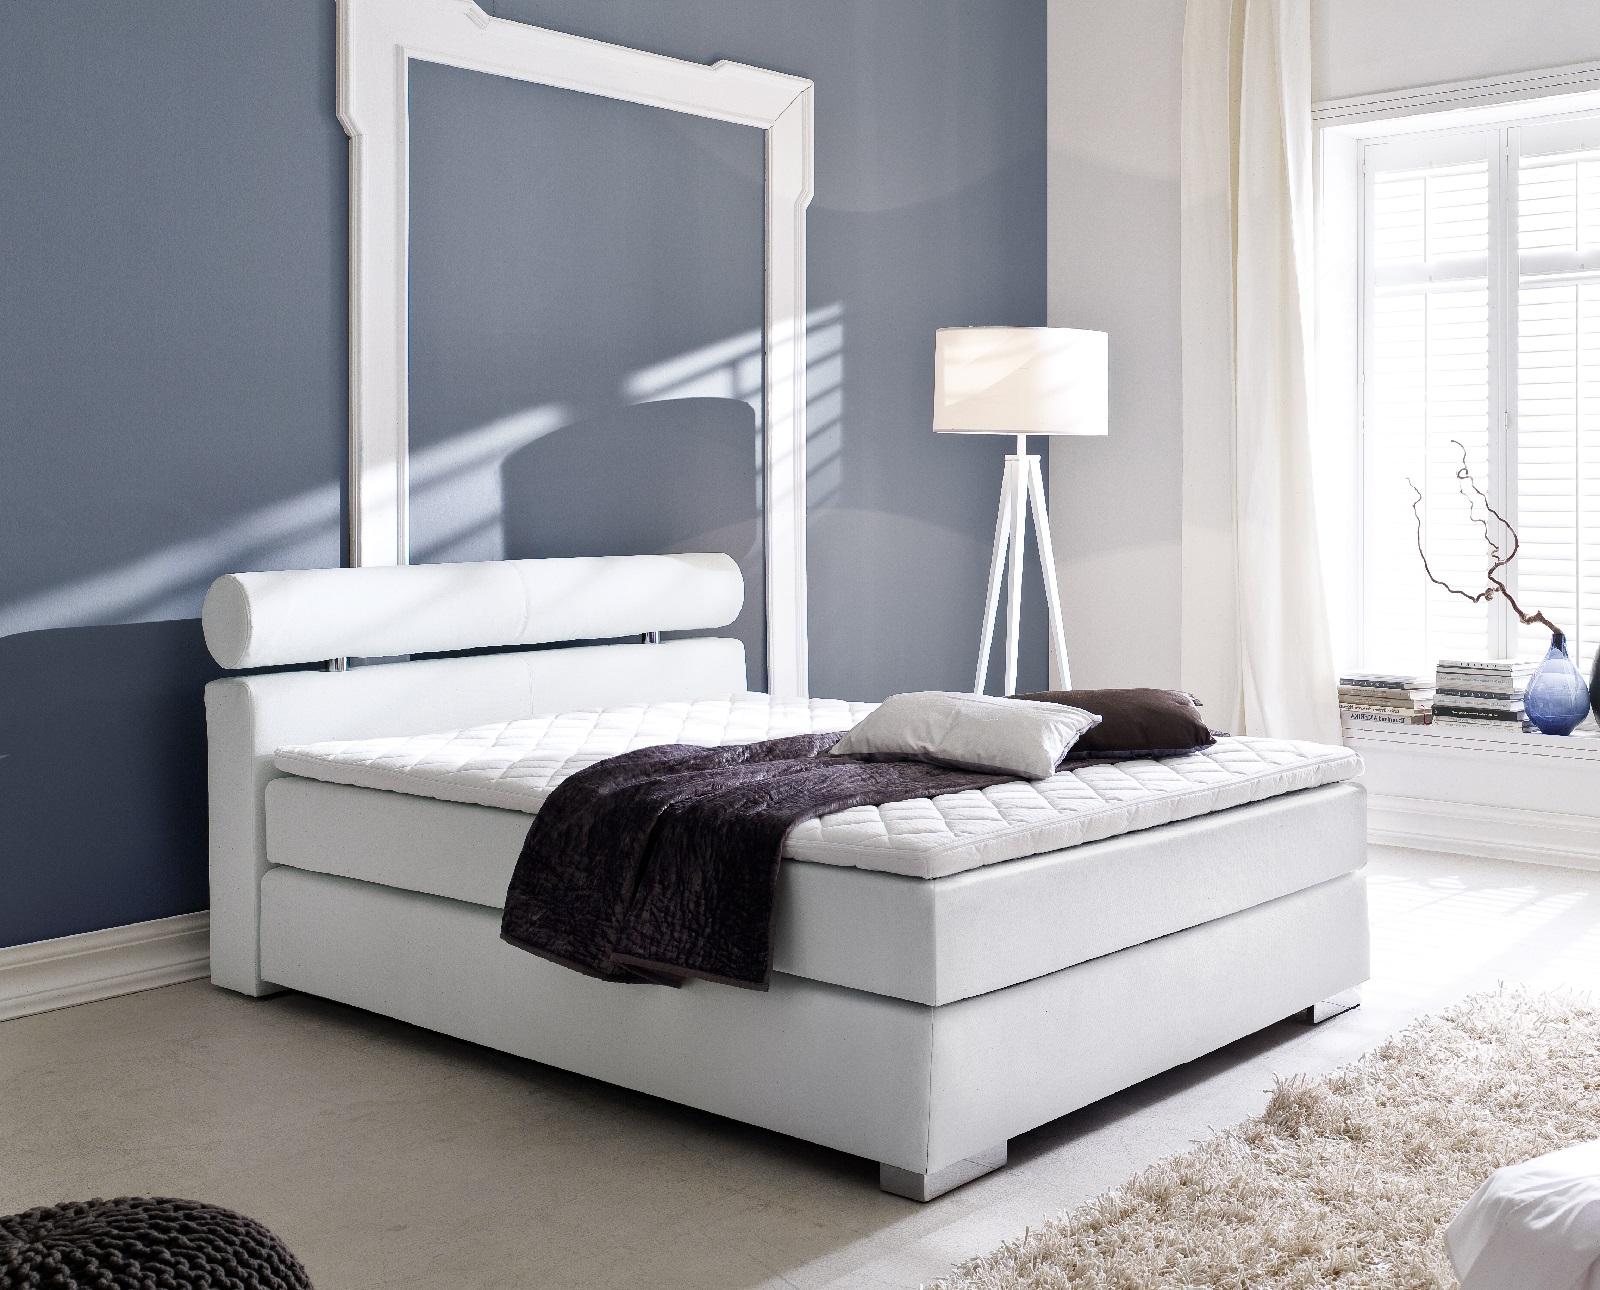 boxspringbett 120 cm boxspringbett 120 x 200 cm inkl kissen und topper boxspringbett 120 x 200. Black Bedroom Furniture Sets. Home Design Ideas